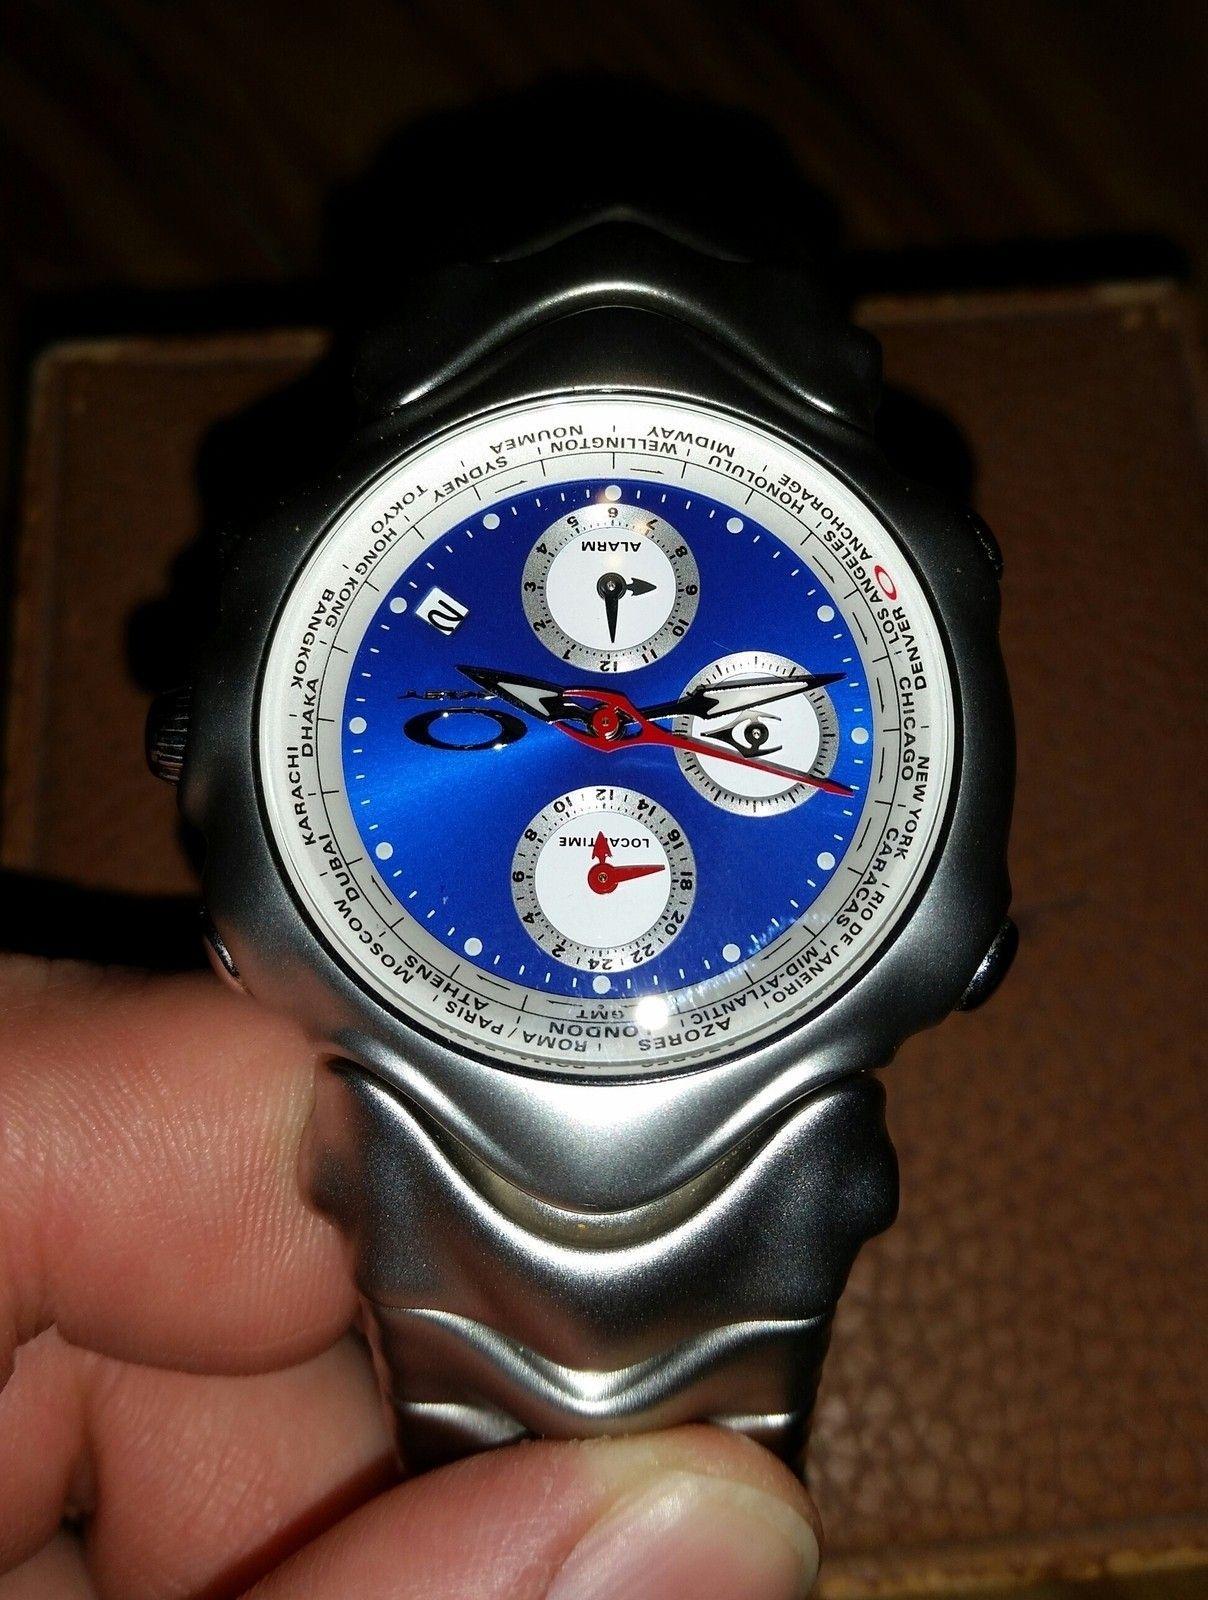 GMT Silver with Blue Face - uploadfromtaptalk1416890255685.jpg